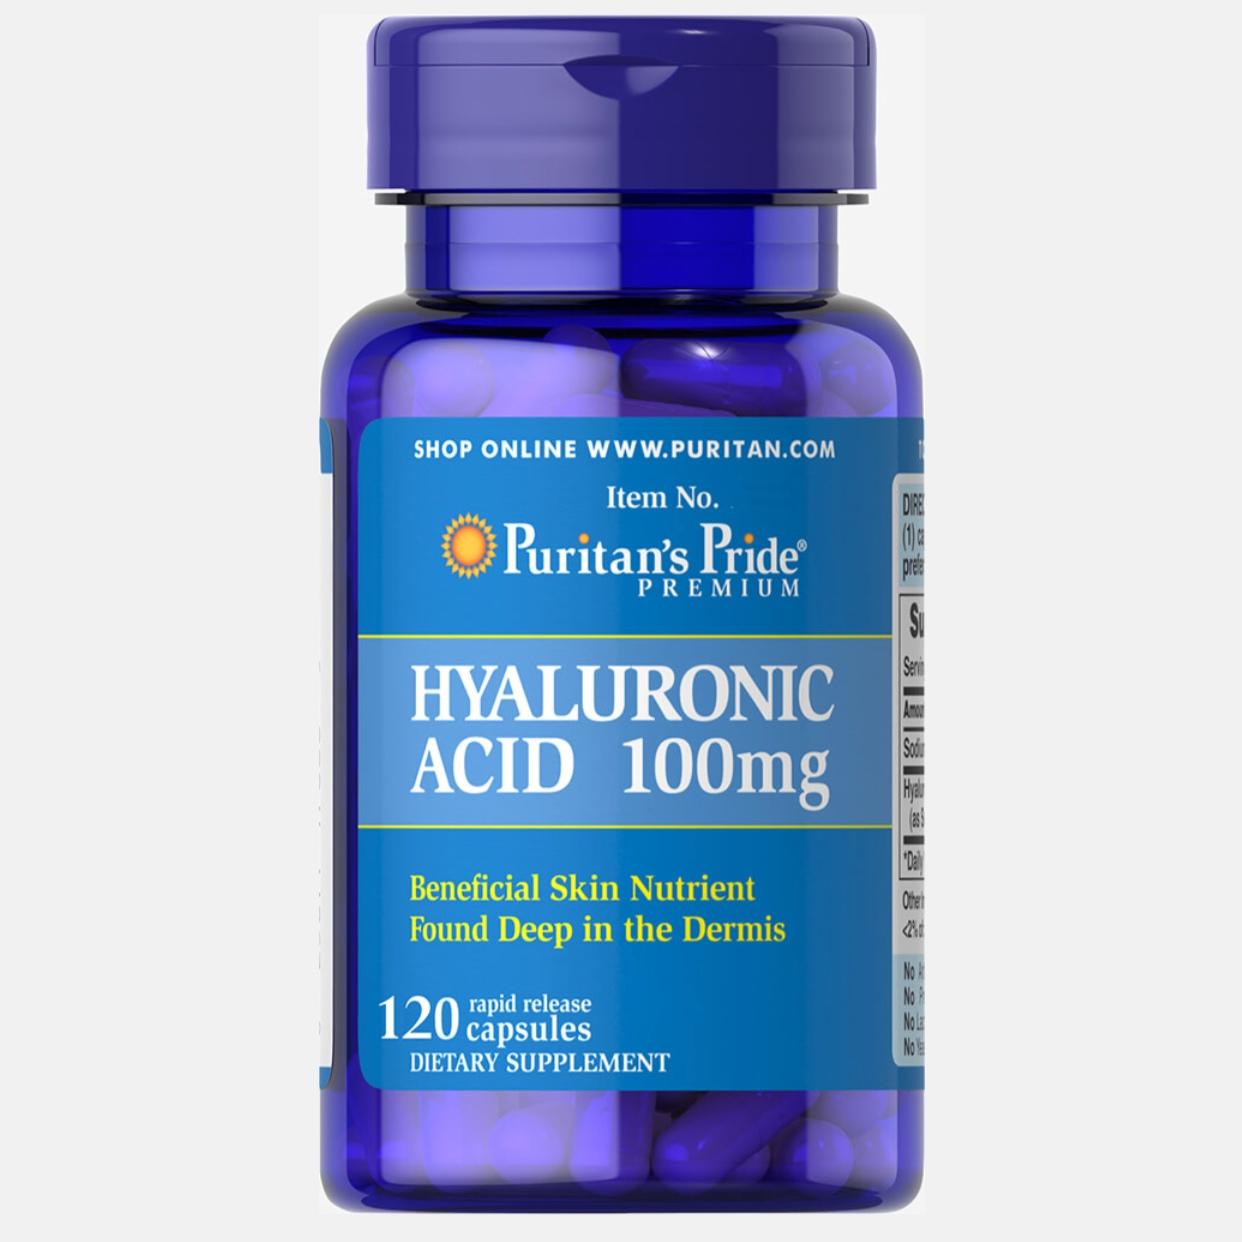 Puritan's Pride, Hyaluronic Acid 100 mg, 120 Capsules